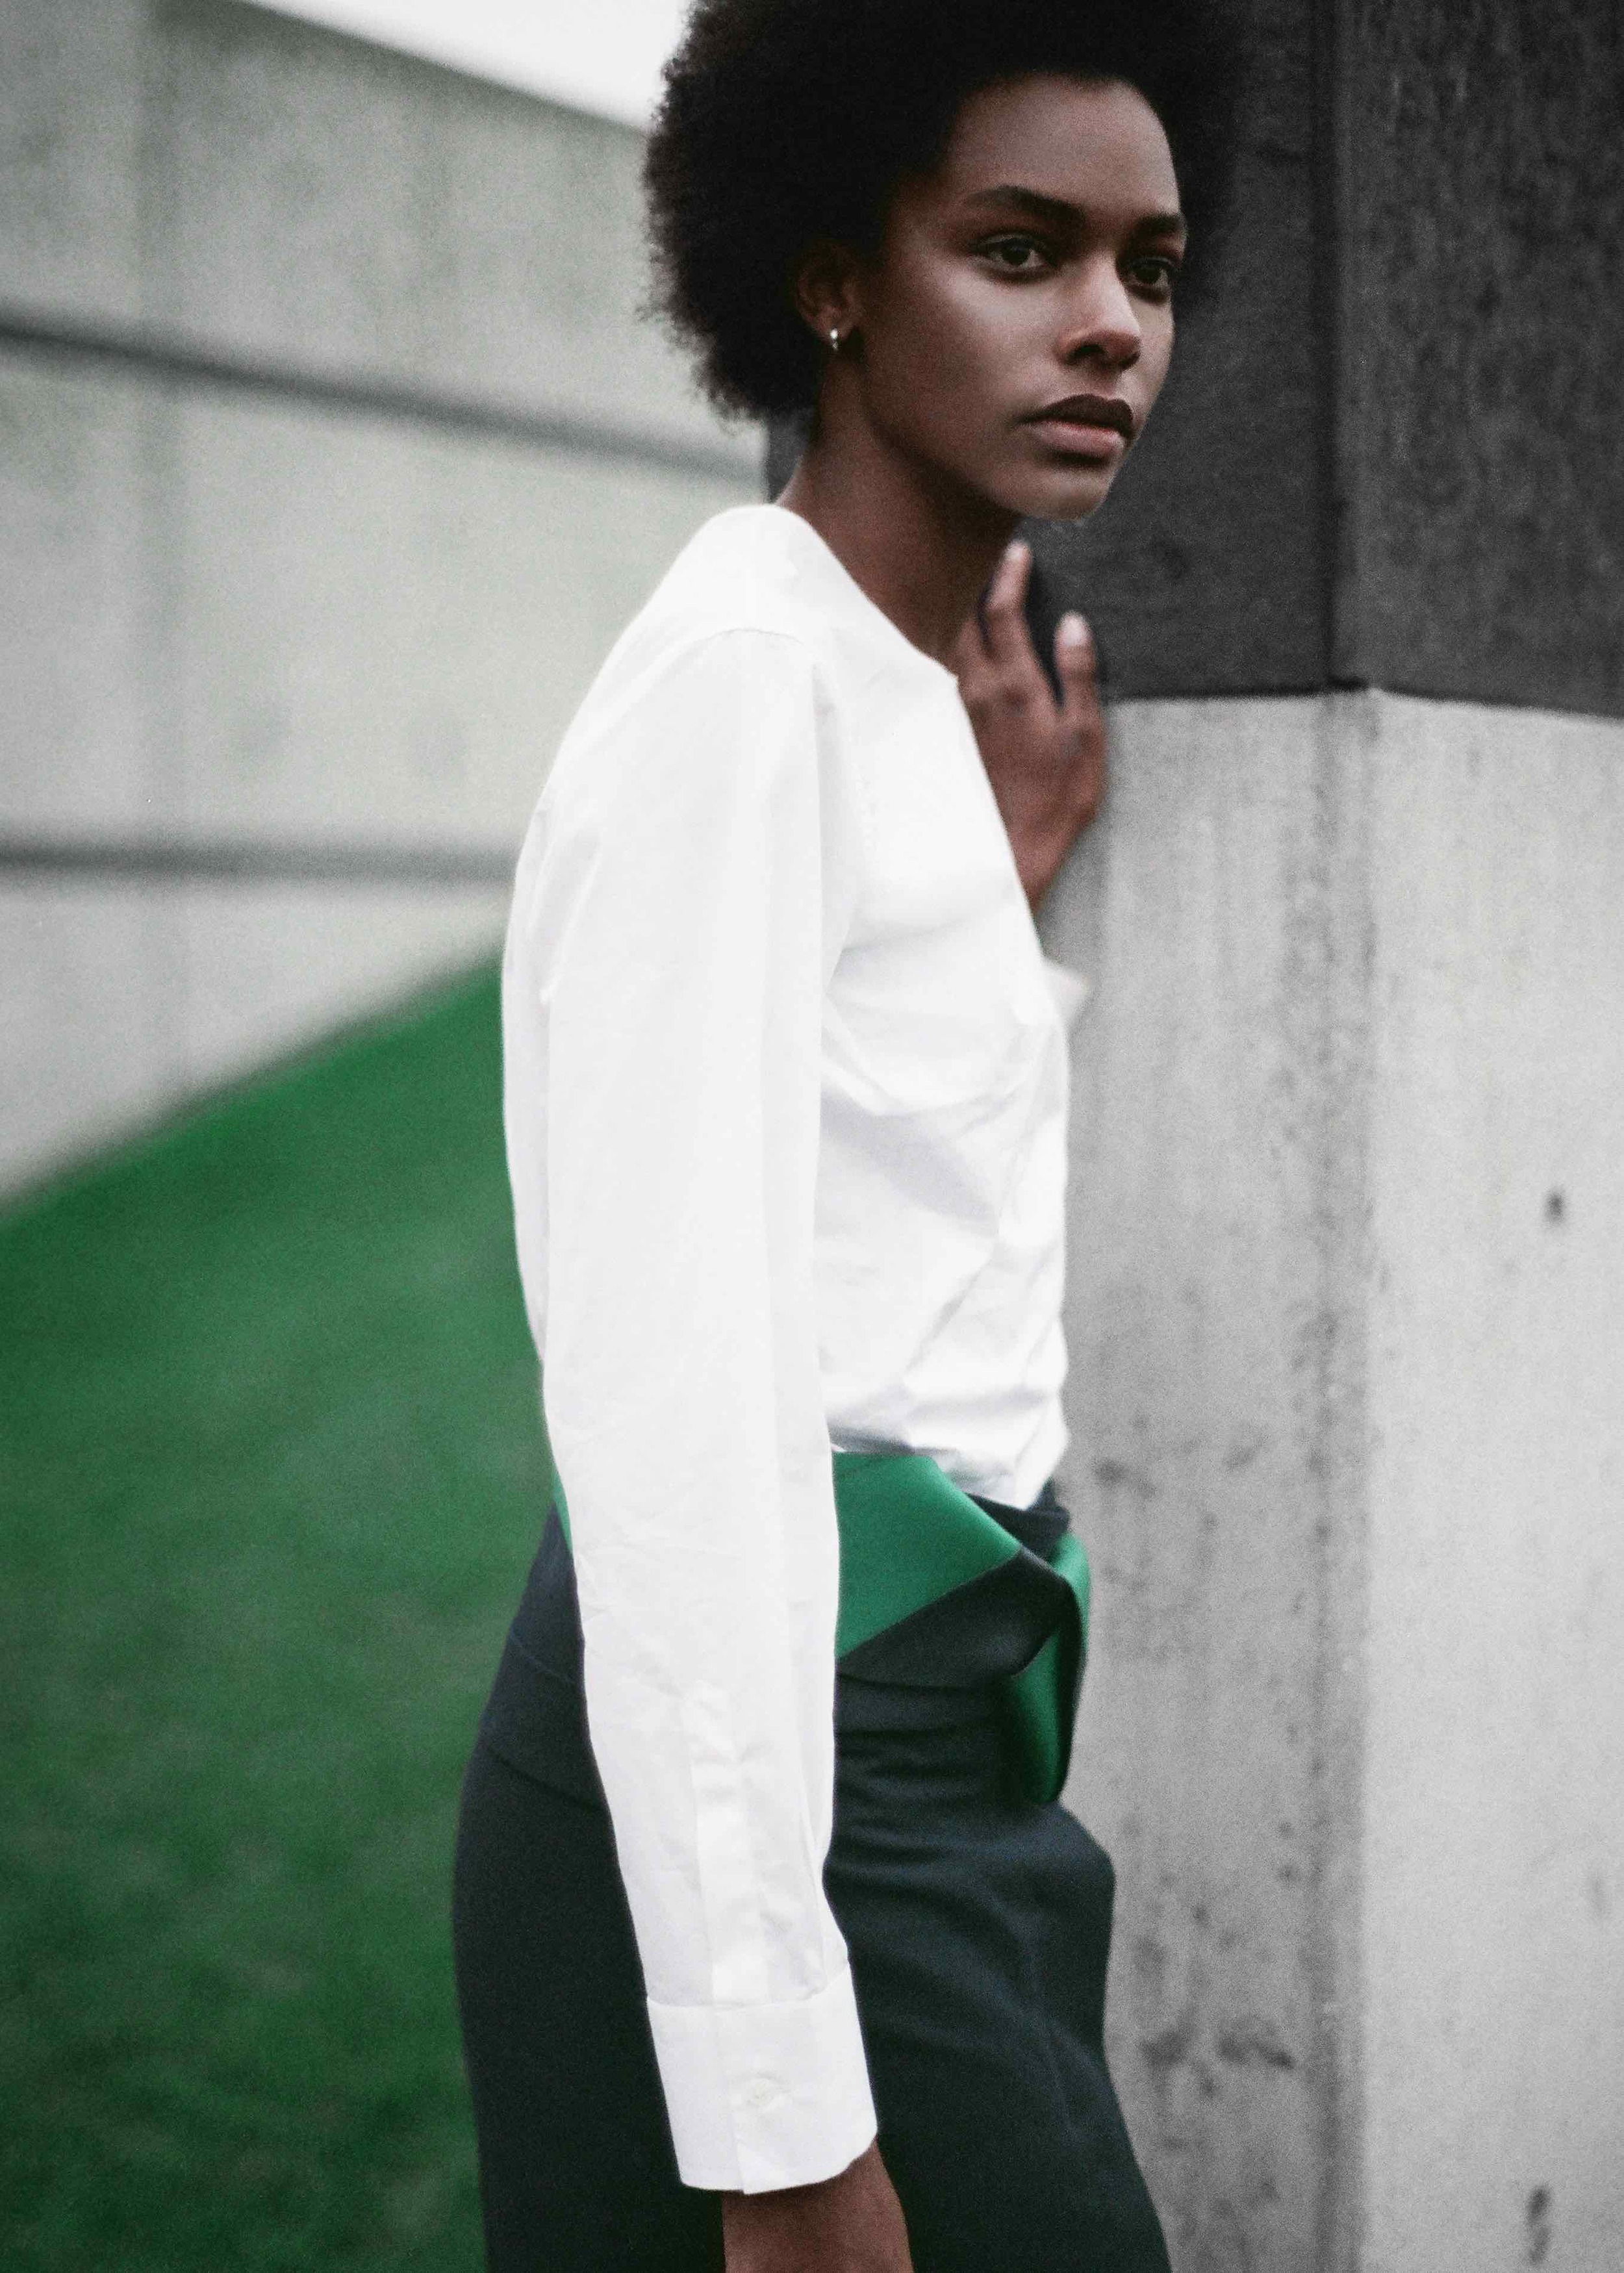 White cotton poplin shirt, cotton gabardine wrap skirt, navy and green leather belt, calf leather socks and sandals.